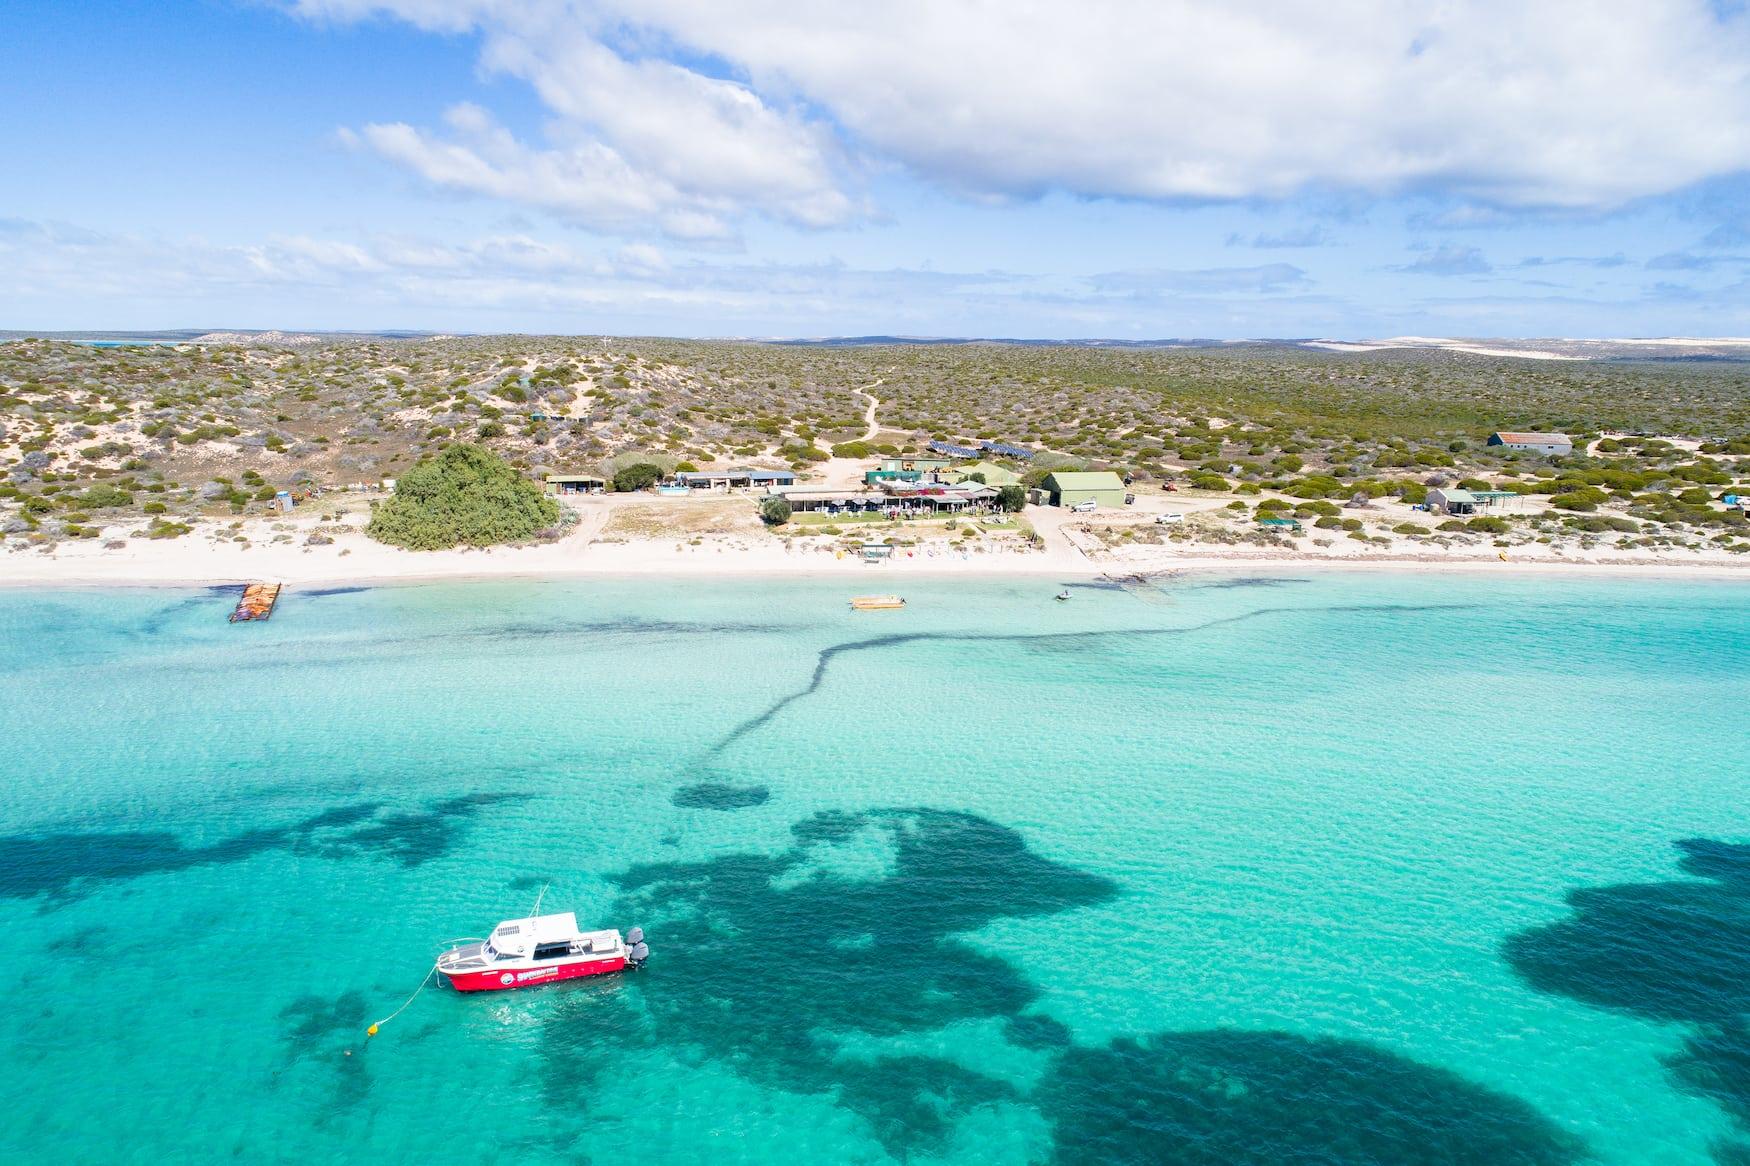 Eco Lodge auf Dirk Hartog Island in Westaustralien